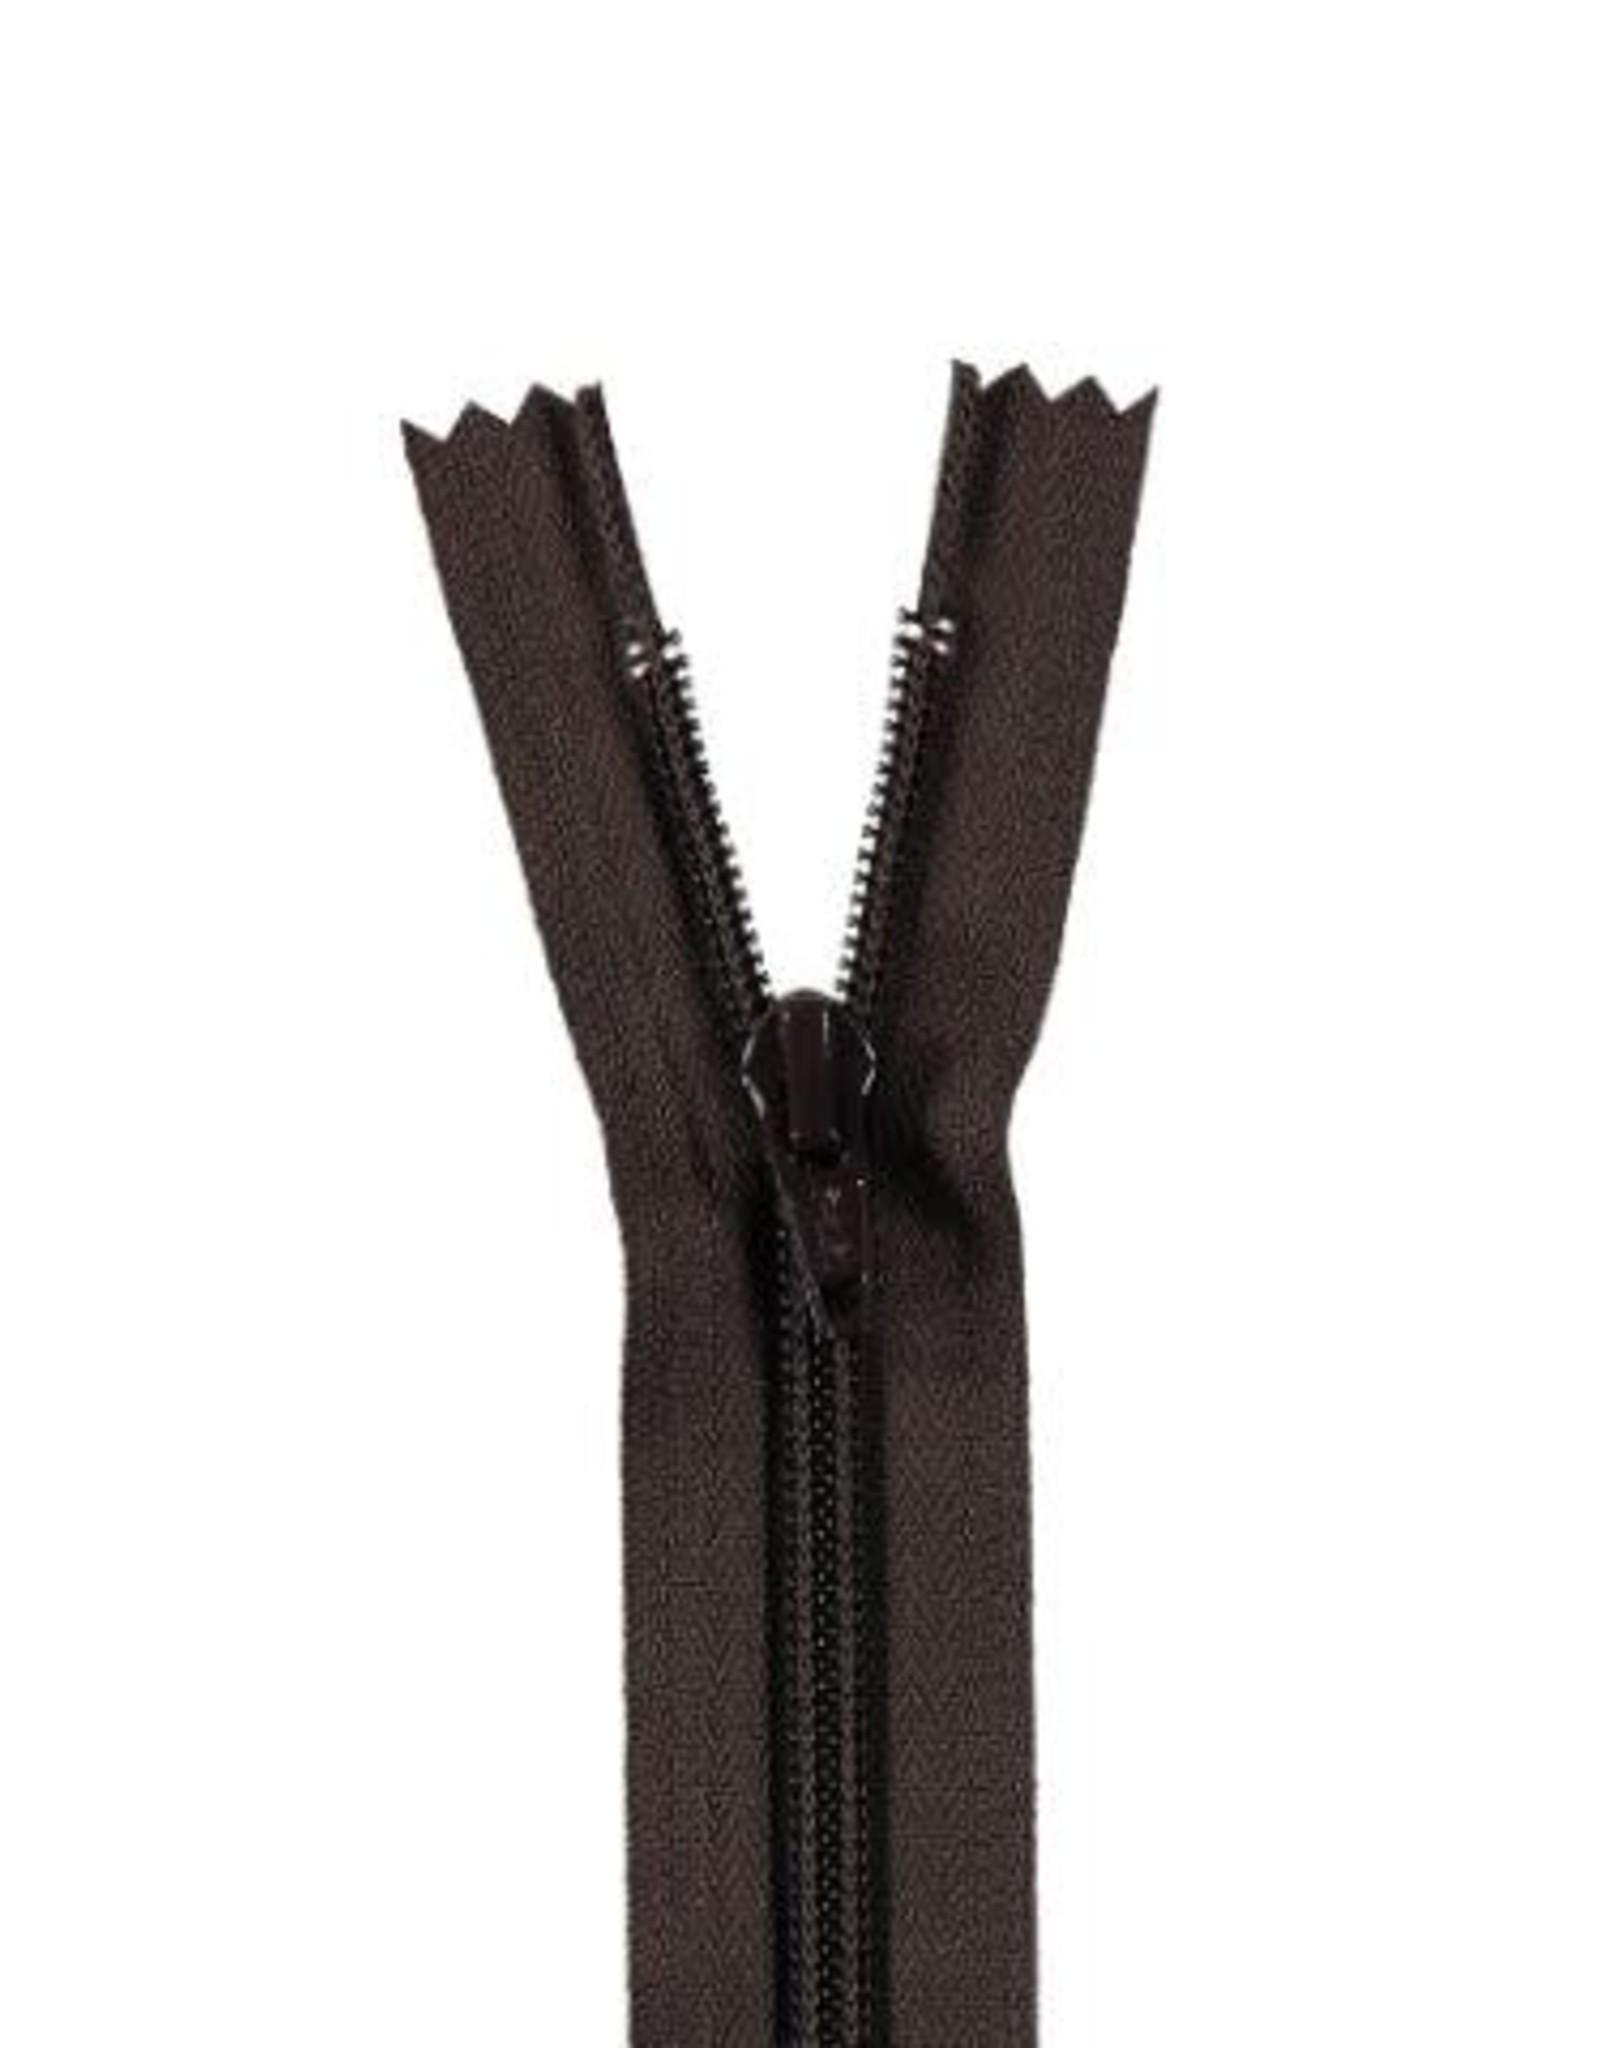 YKK Spiraalrits niet-DB 3mm donker bruin 570-30cm